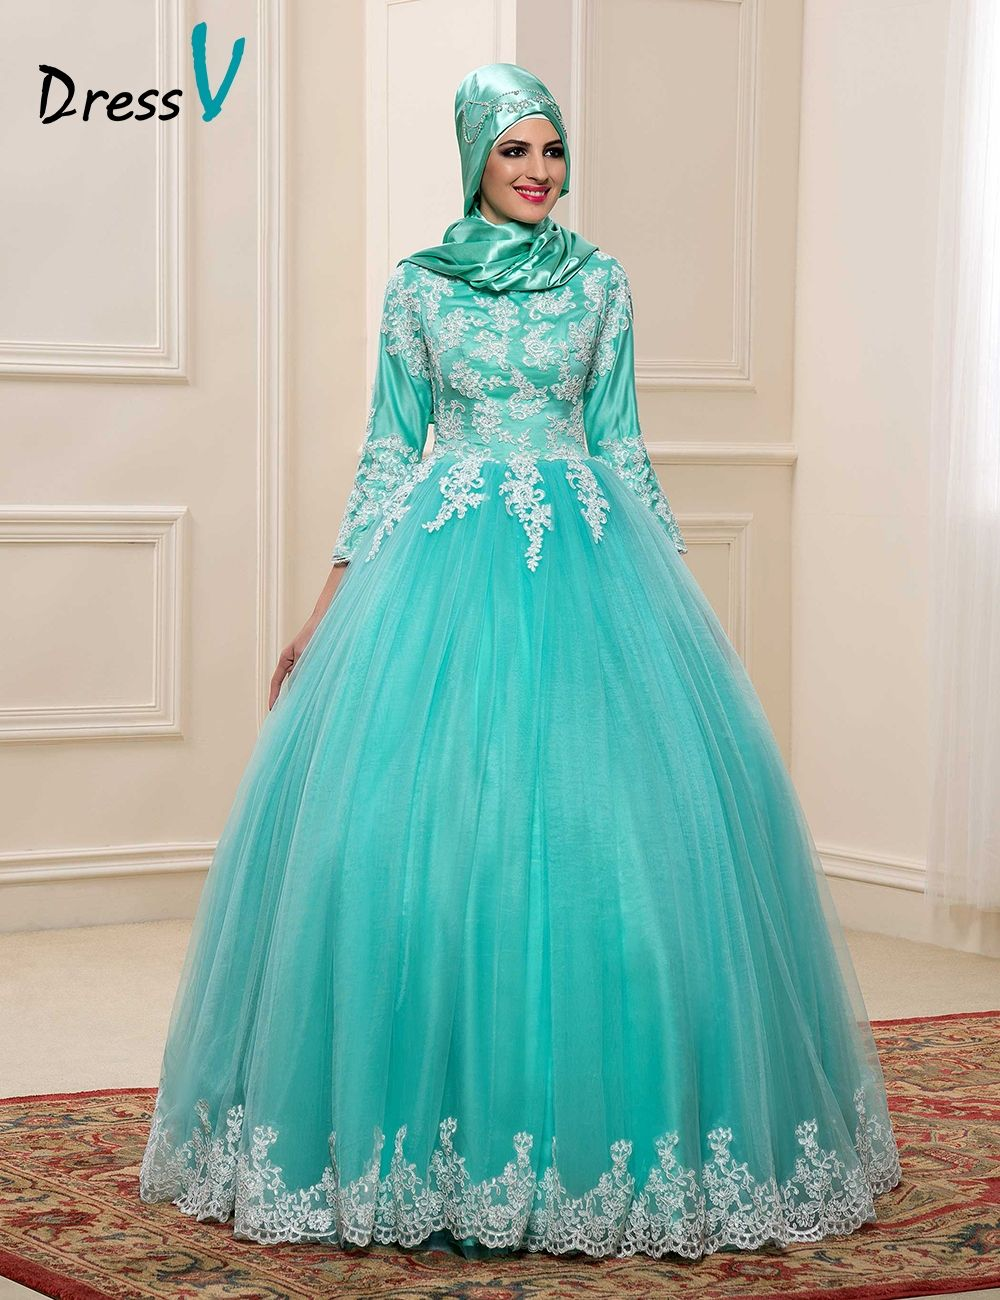 2017 Muslim Wedding Dresses With Hijab High Neck 3/4 Sleeves Mint ...